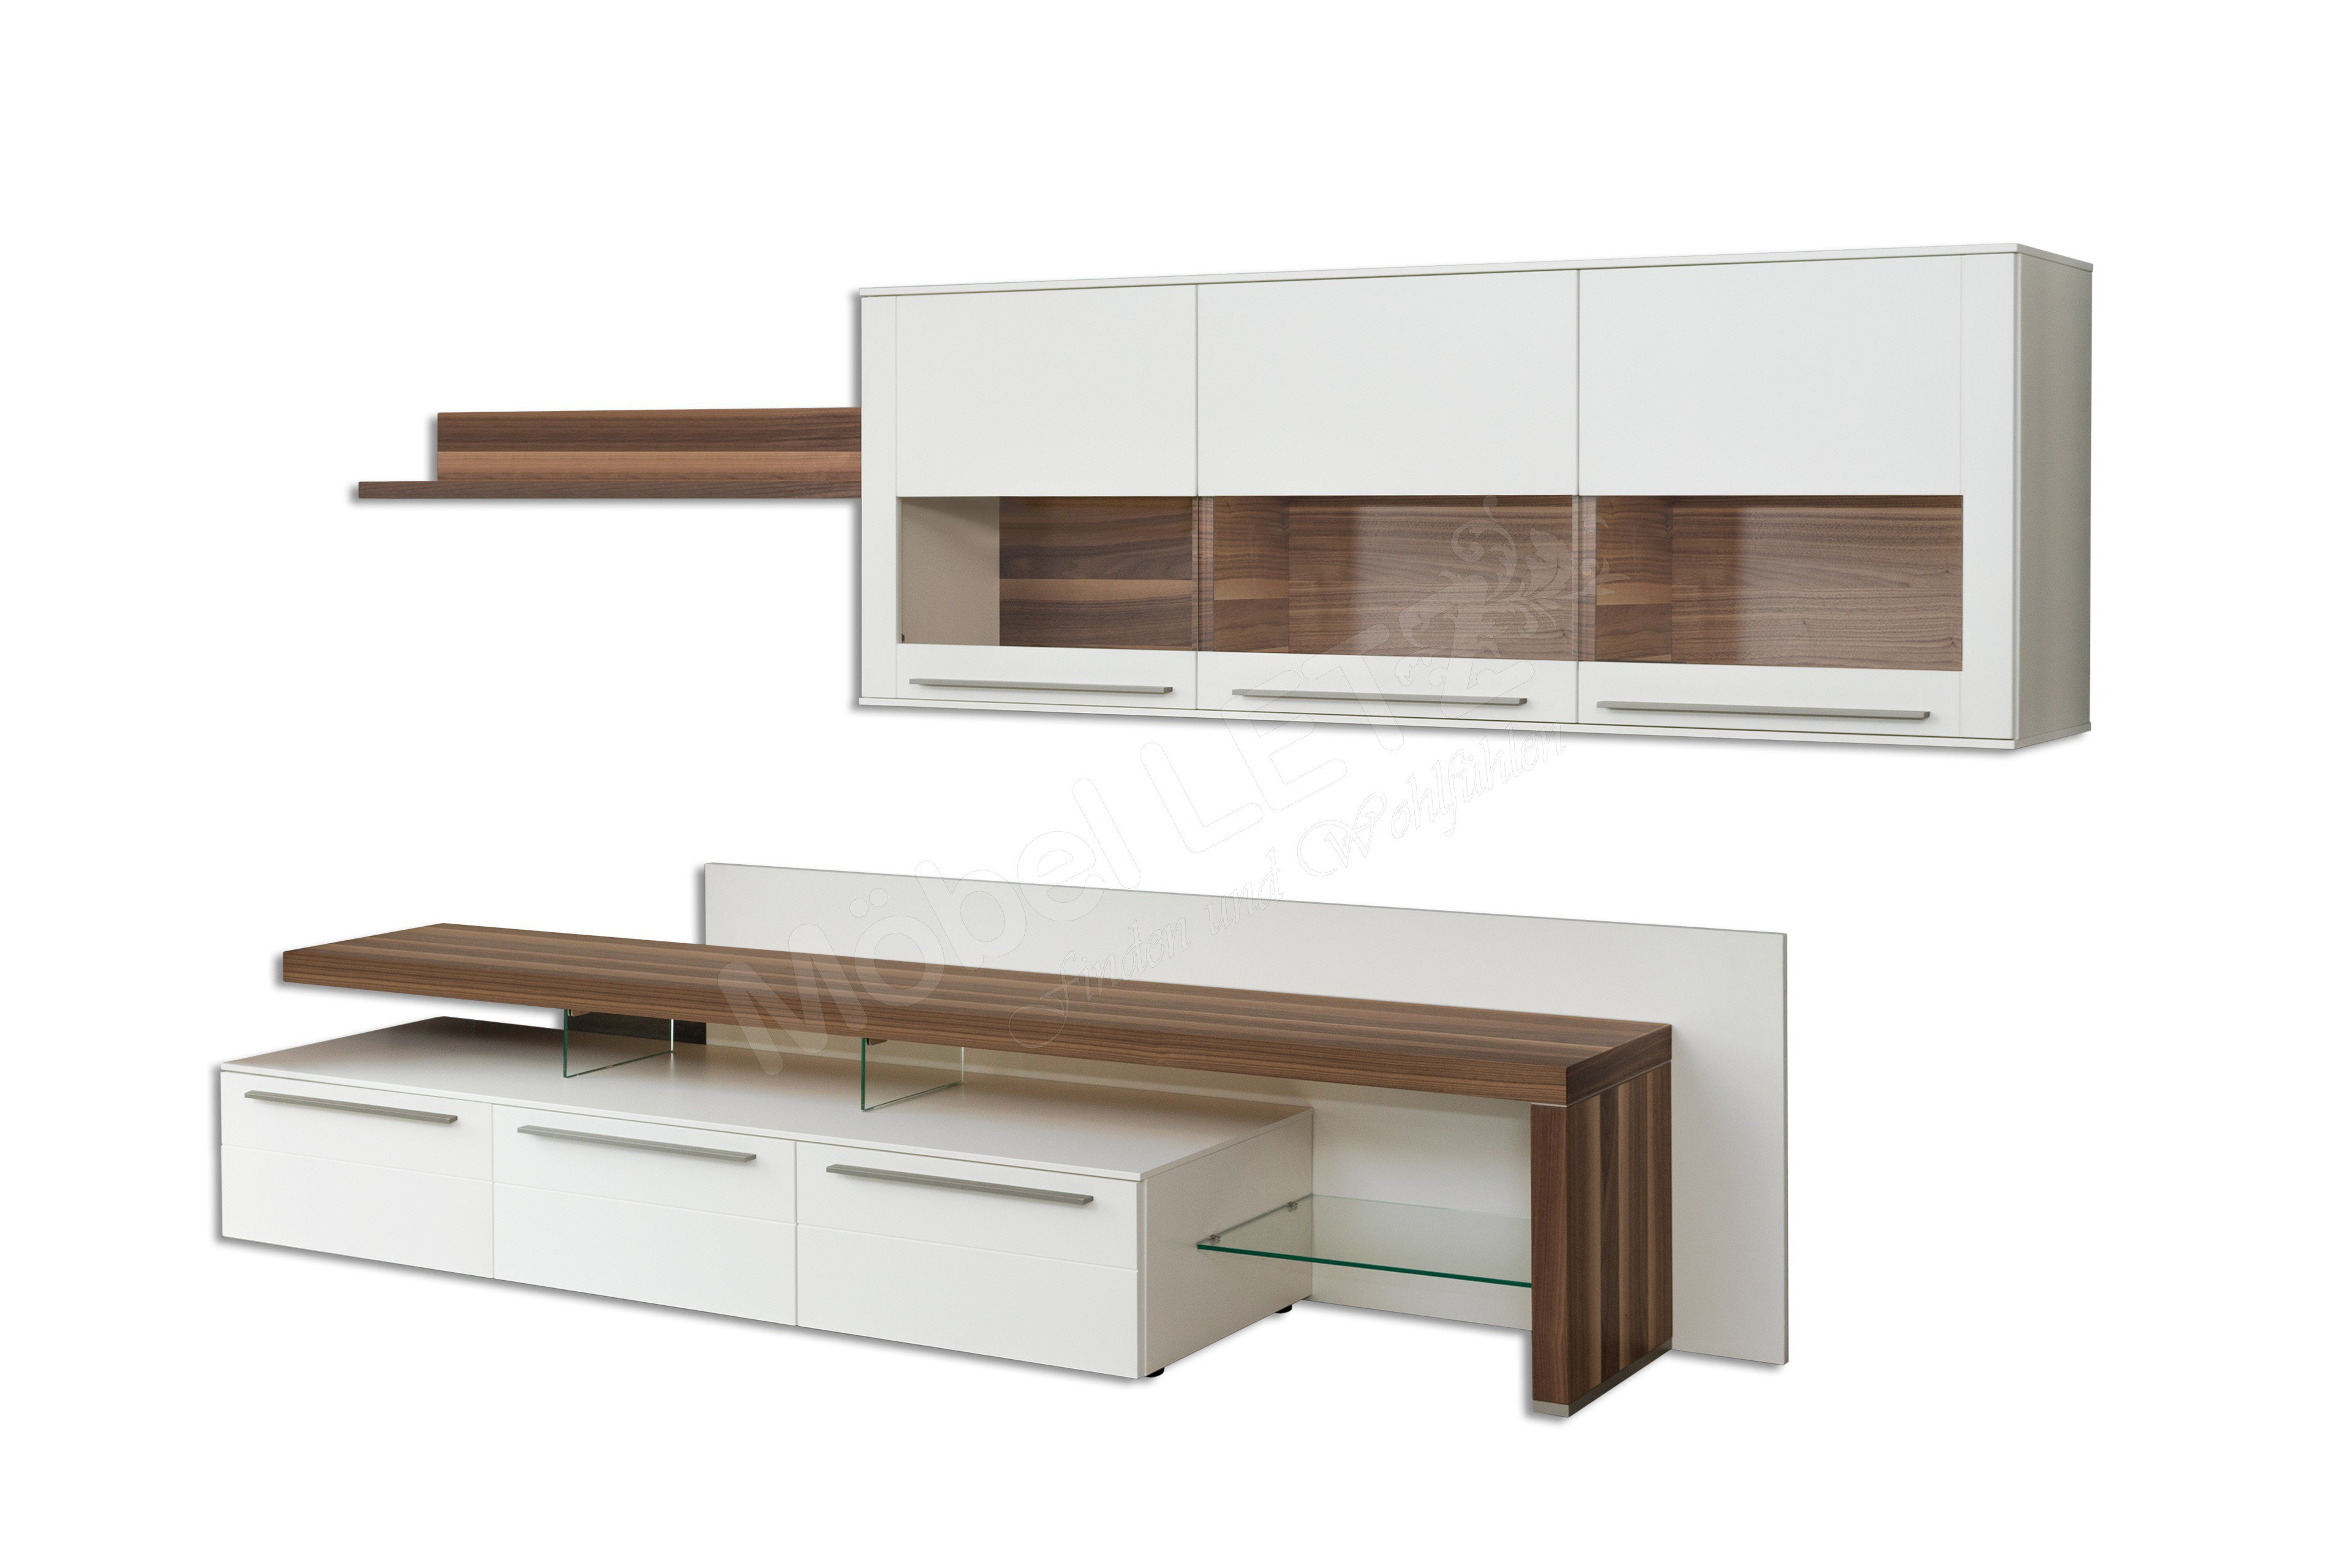 gwinner wohnwand bellano be30 mit beleuchtung m bel letz. Black Bedroom Furniture Sets. Home Design Ideas